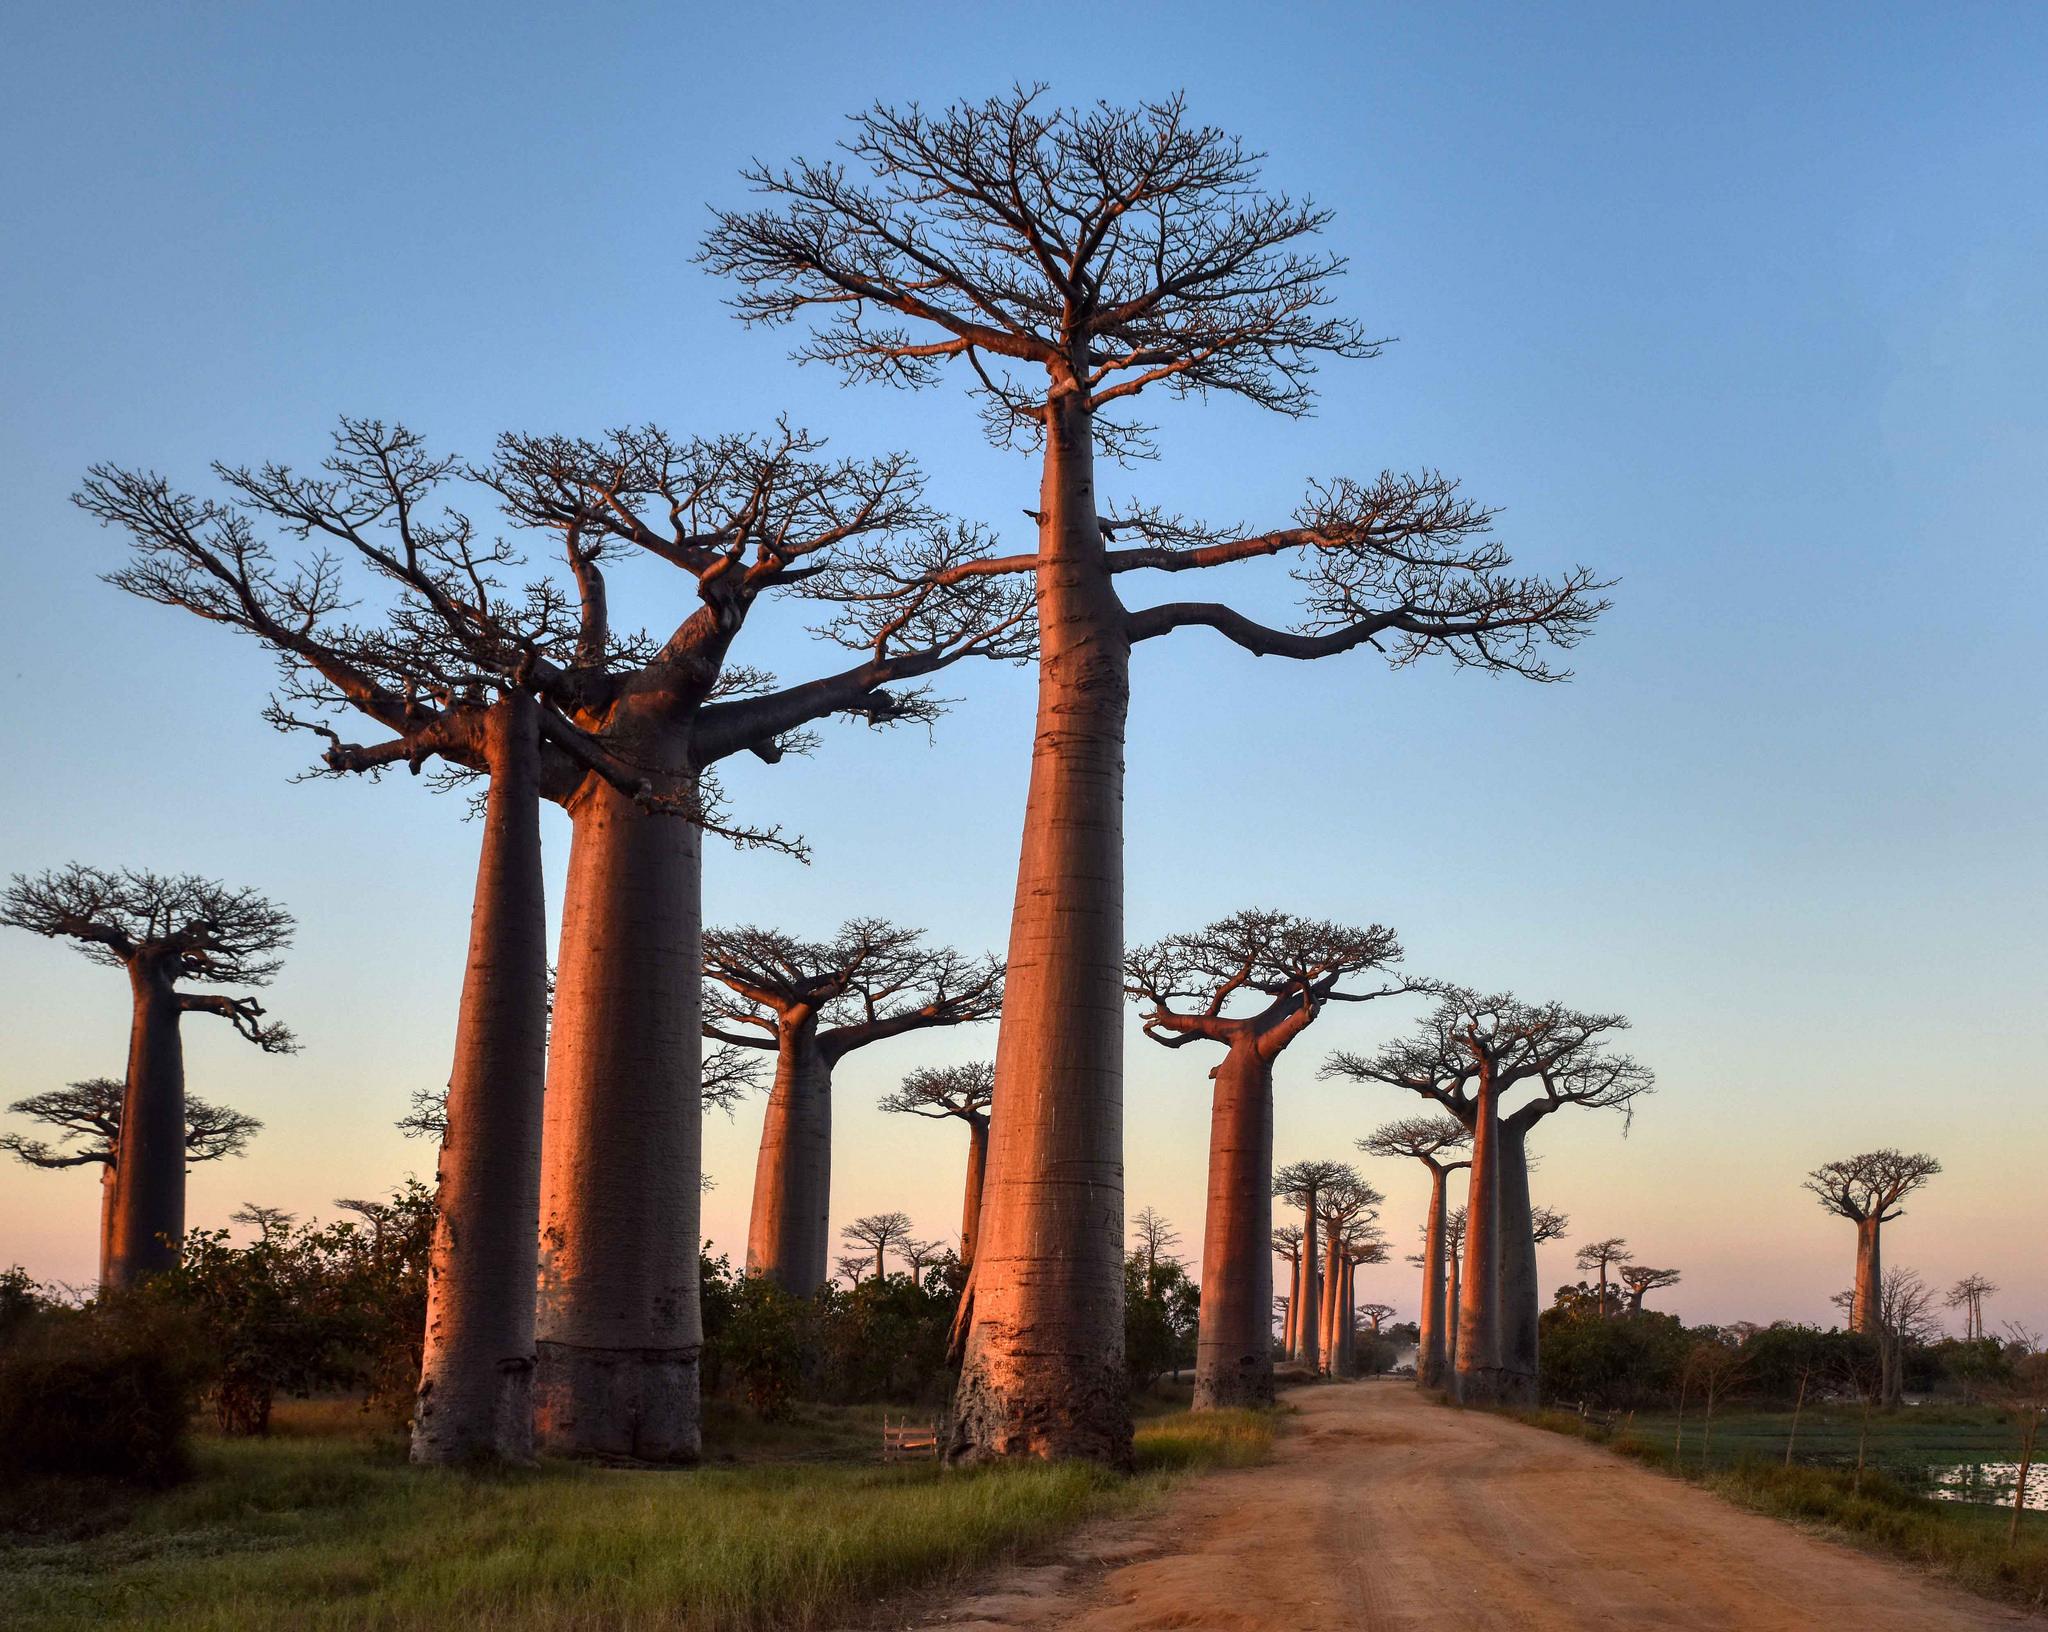 These awe-inspiring baobab trees are reason enough to visit Madagascar. Image credit:    Rod Waddington   /   Creative Commons